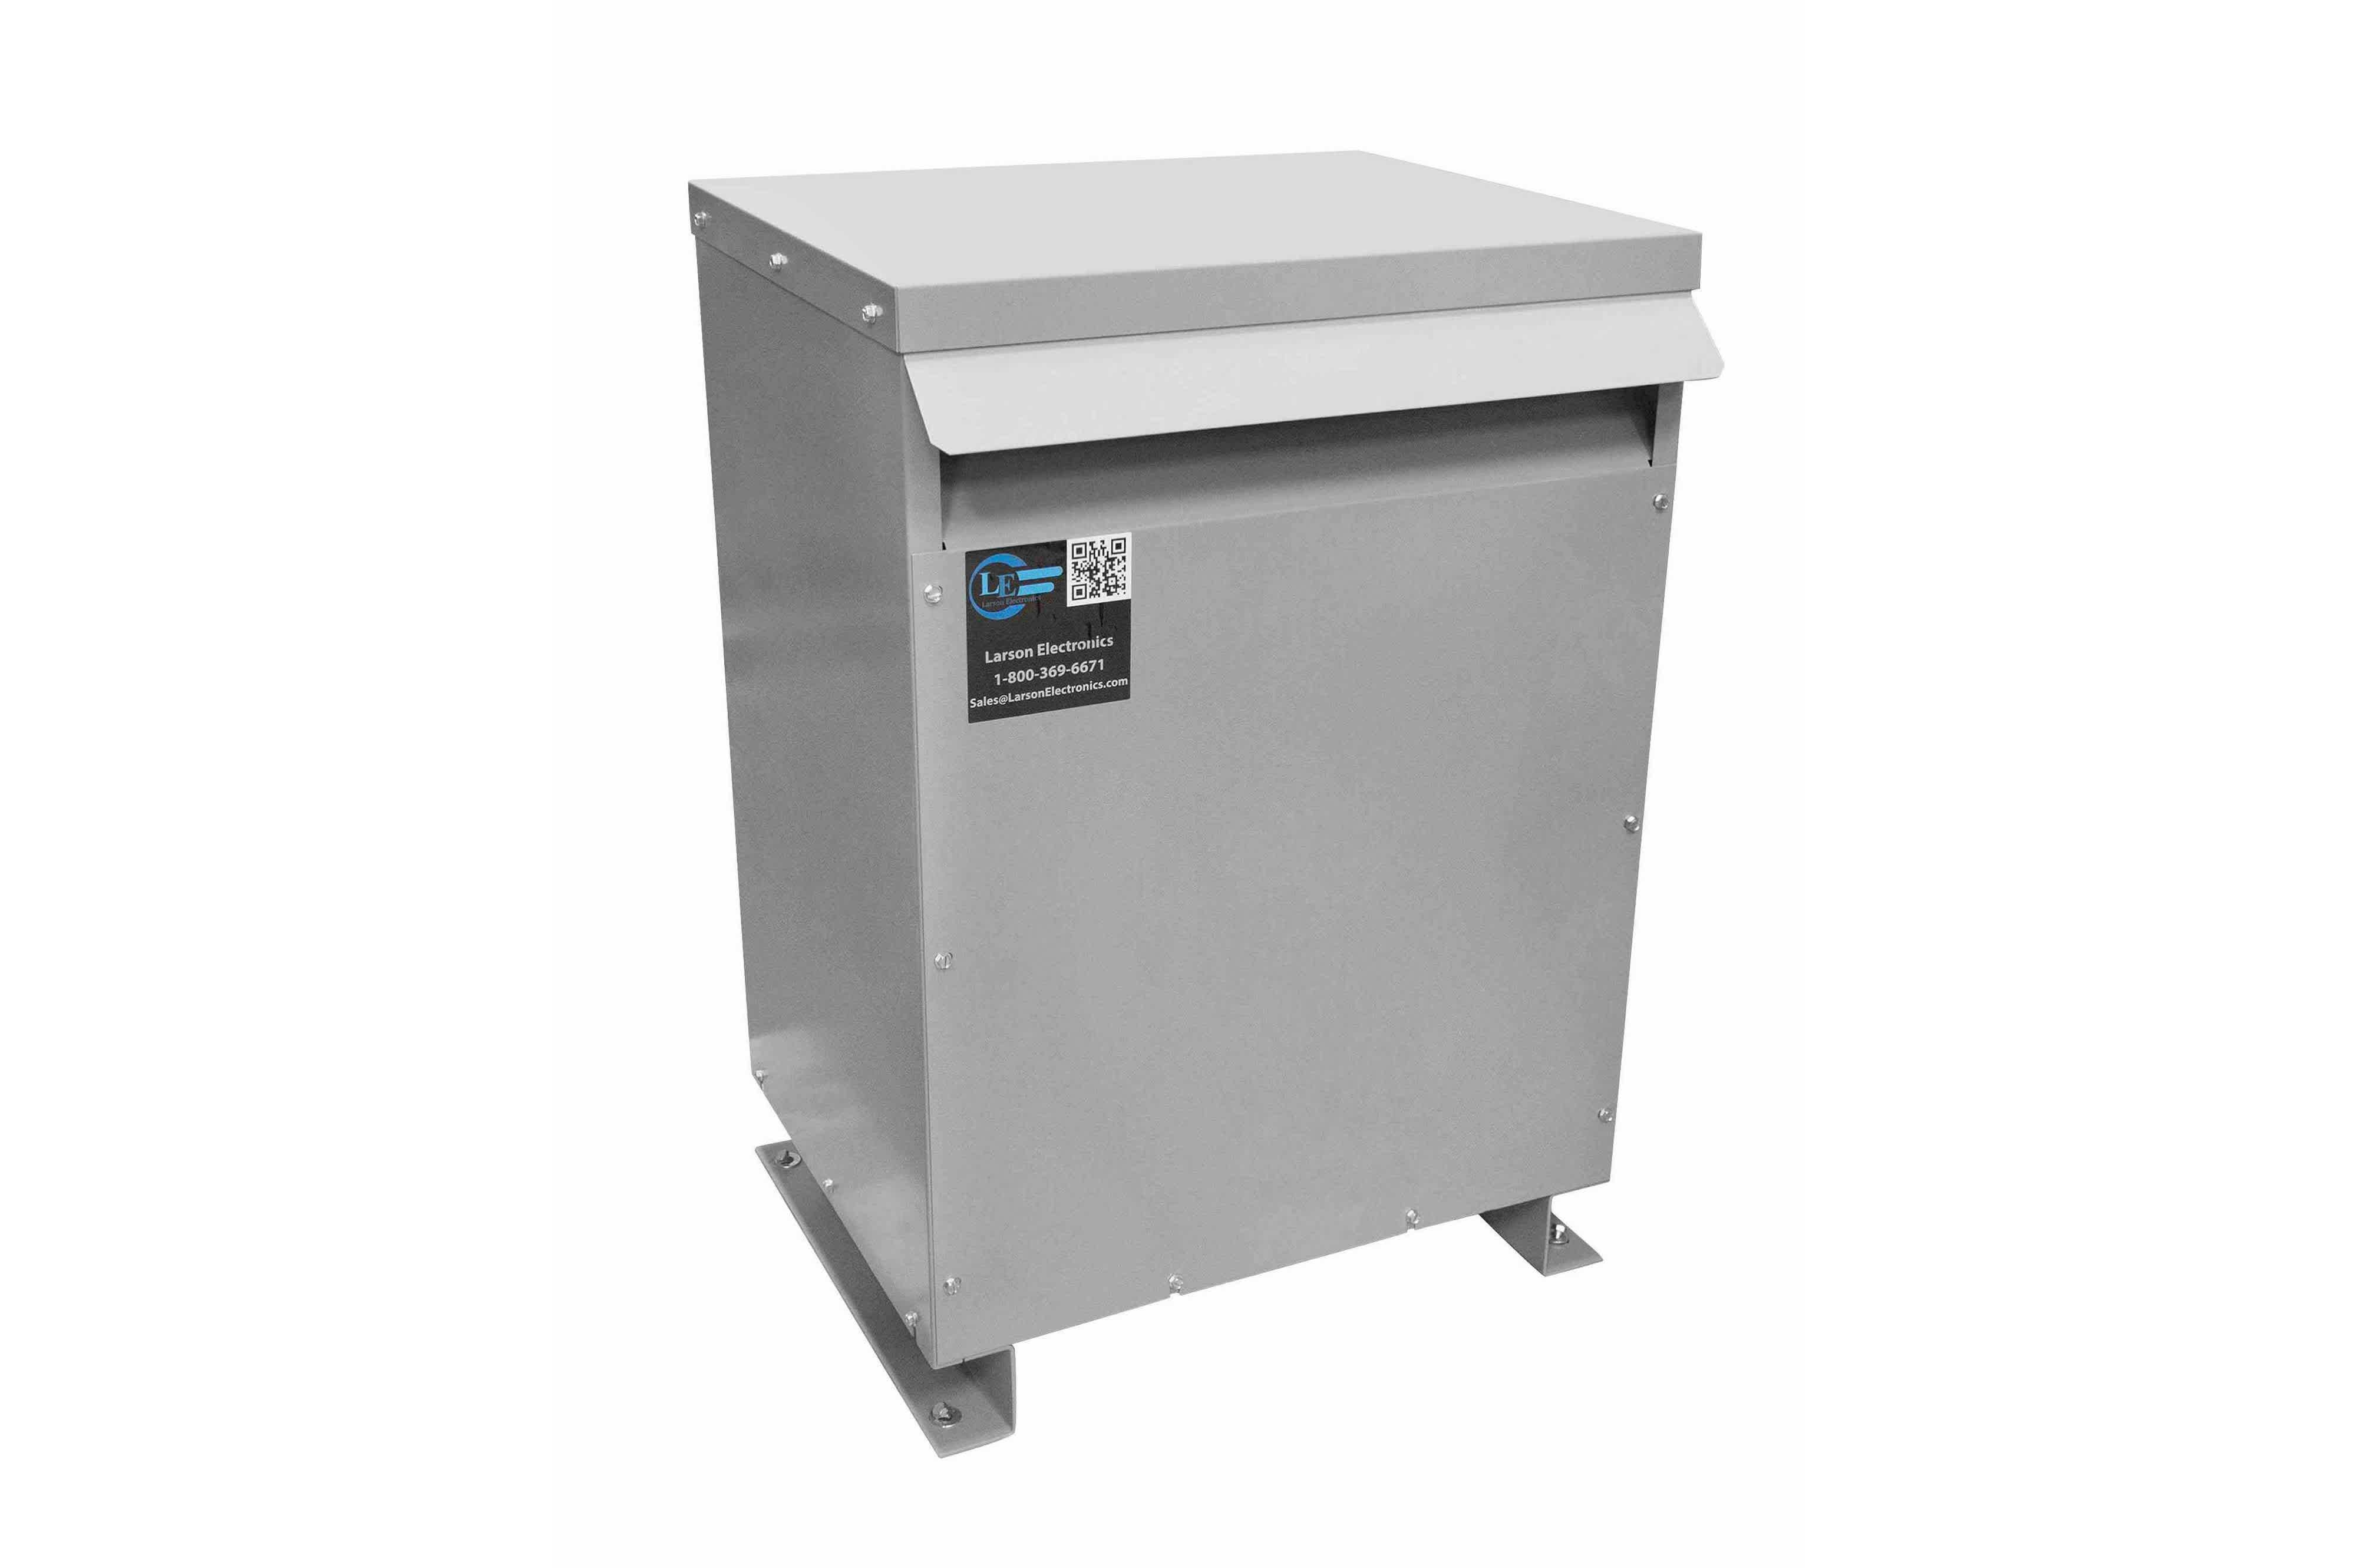 50 kVA 3PH Isolation Transformer, 240V Wye Primary, 415Y/240 Wye-N Secondary, N3R, Ventilated, 60 Hz